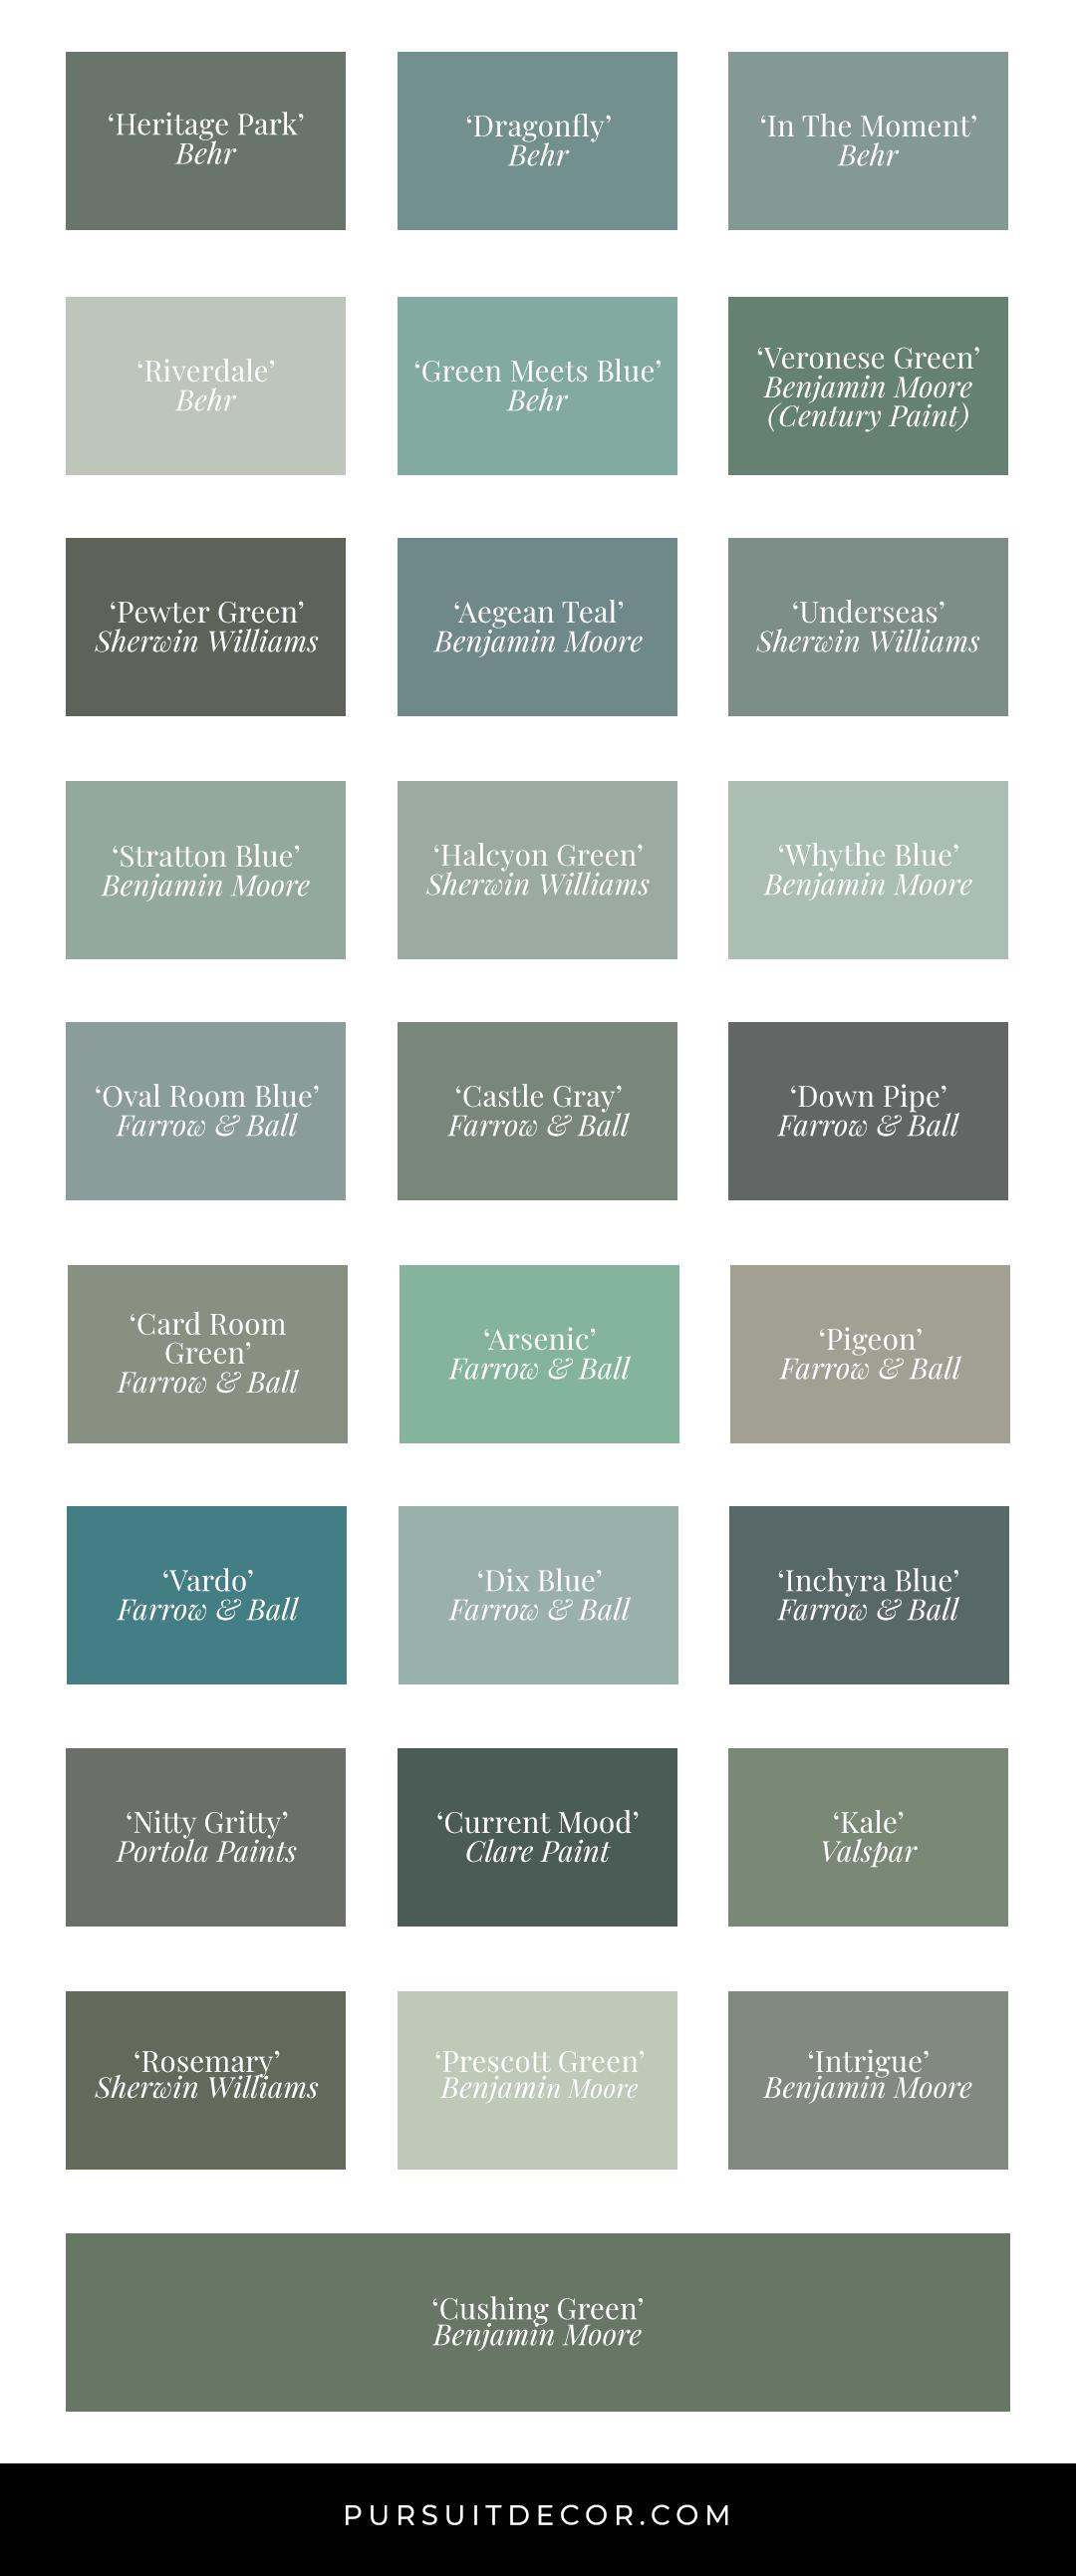 Best Blue Green Paint Colors in Action (by Brand) - Pursuit Decor. Feat. Behr, Benjamin Moore, Sherwin Williams, Valspar, Clare Paint, Farrow & Ball, Portola Paints.